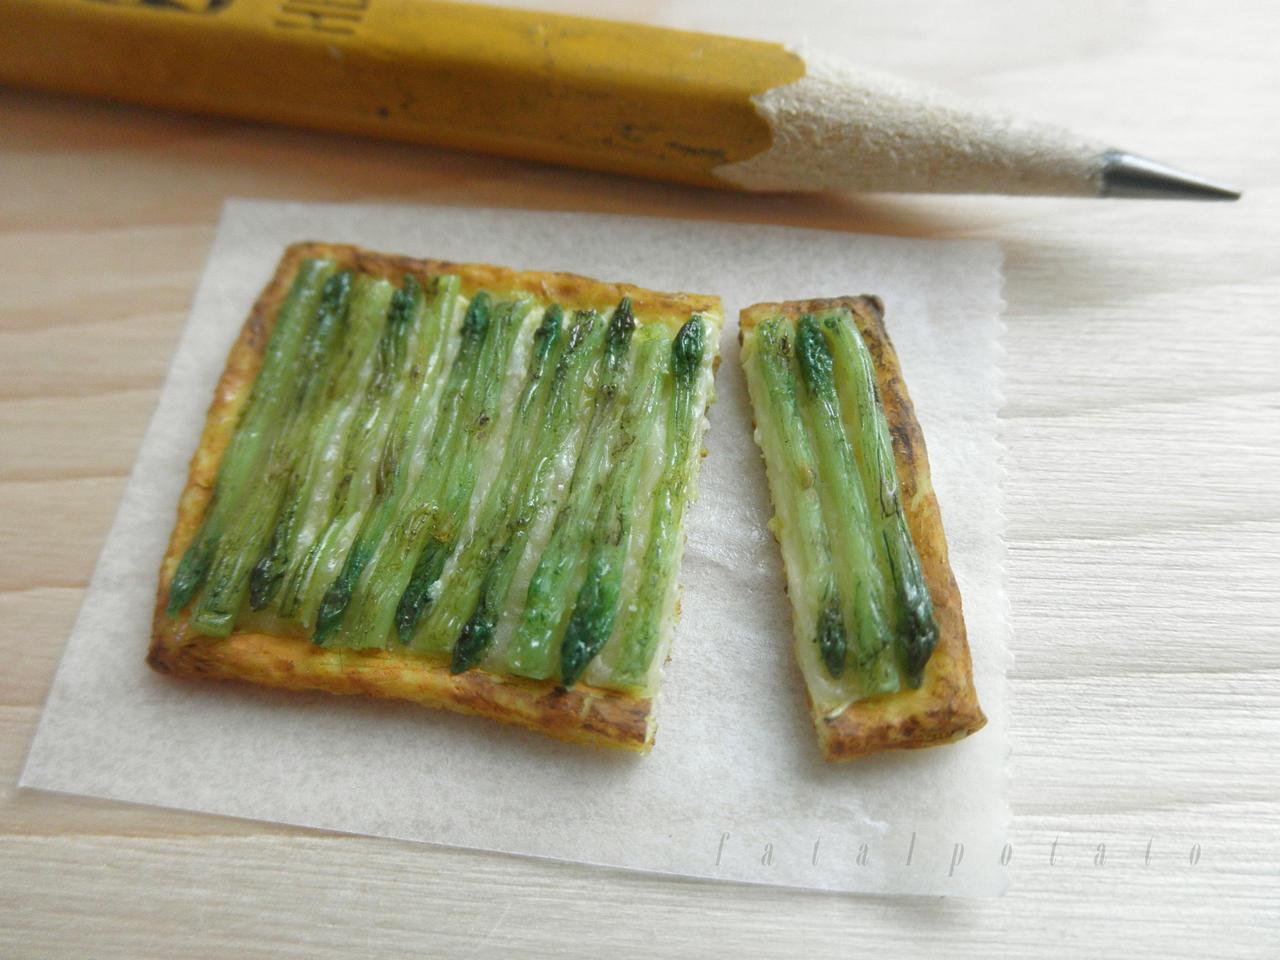 1:12 tart of asparagus by FatalPotato